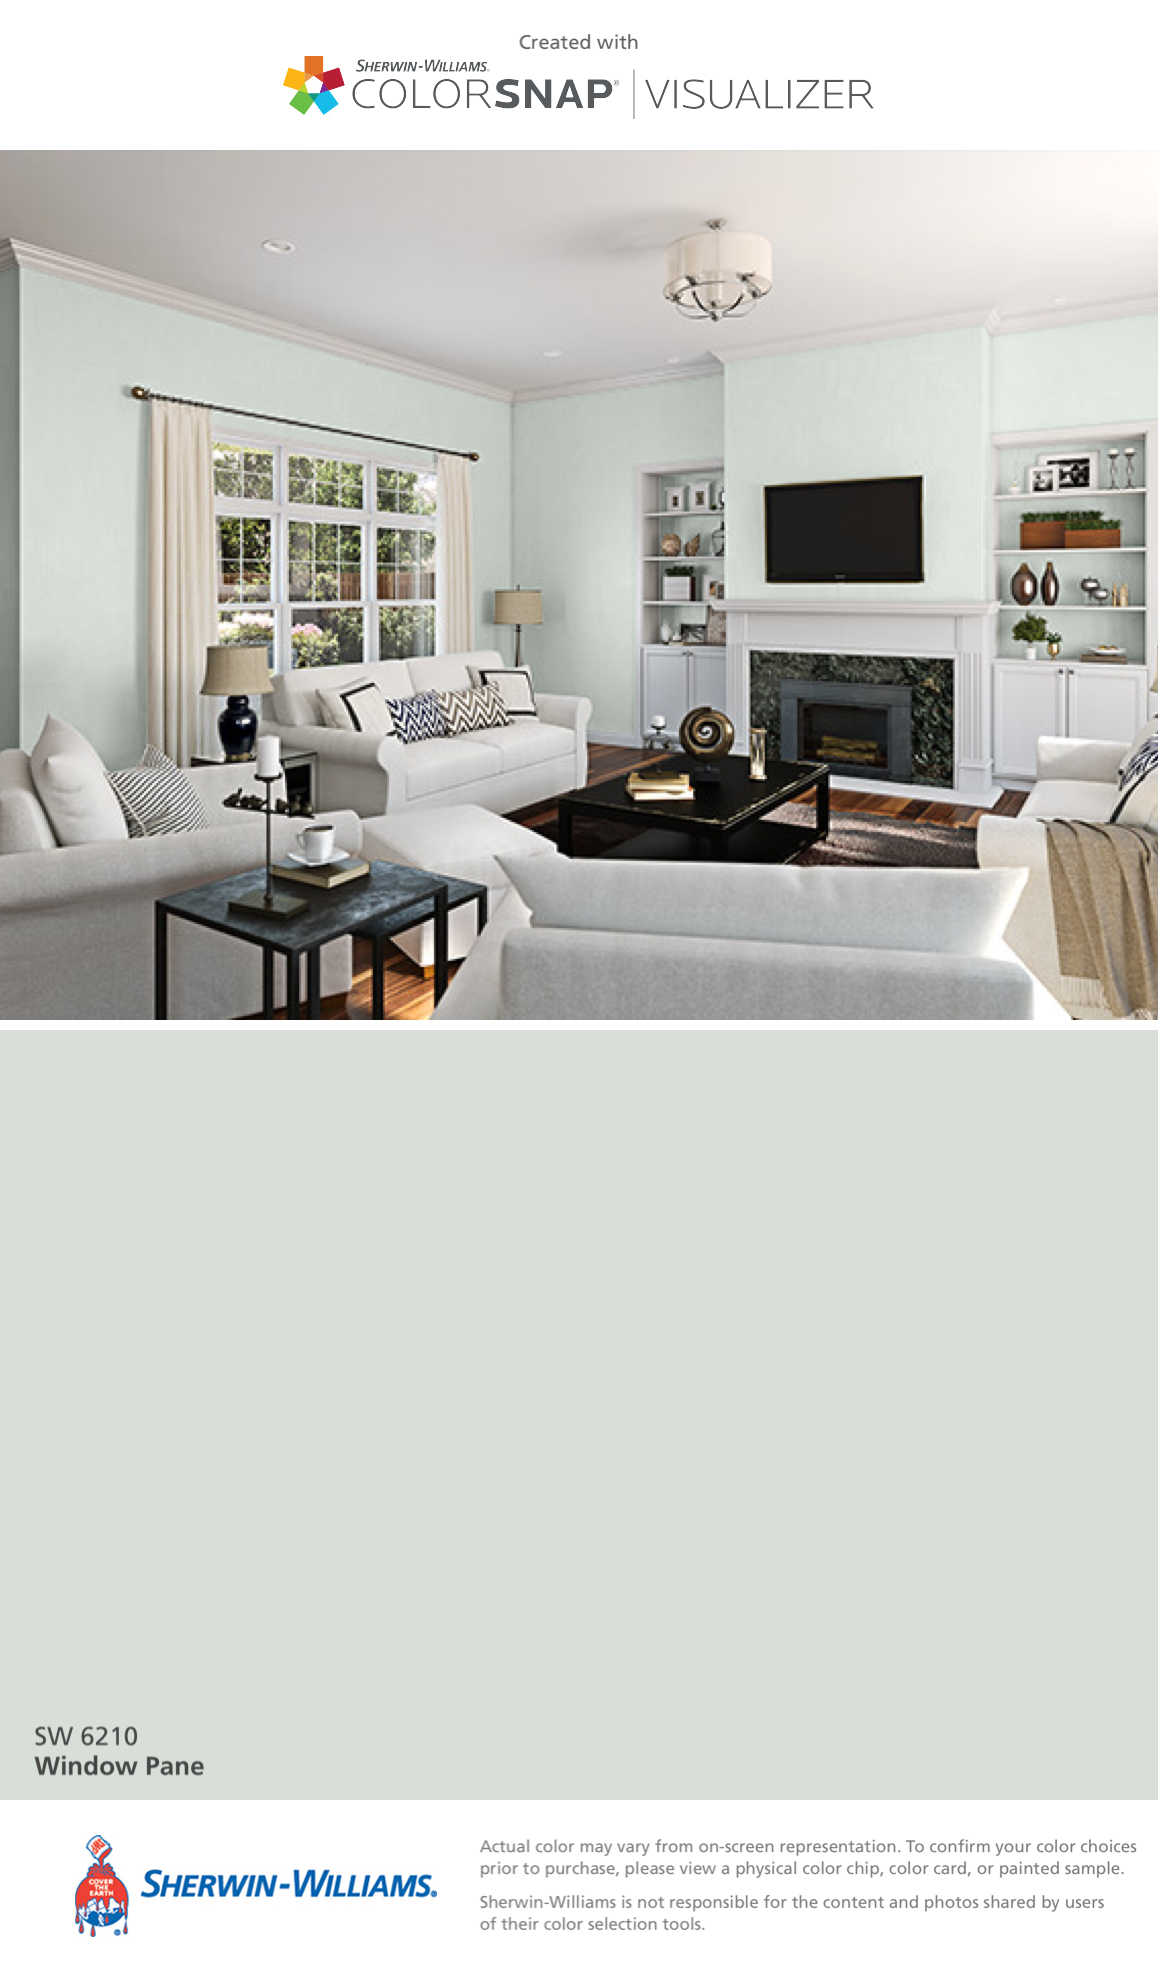 Paint Color Matching App Colorsnap Paint Color App Sherwin Williams Paint Colors For Home Room Paint Colors Sherwin Williams Paint Colors